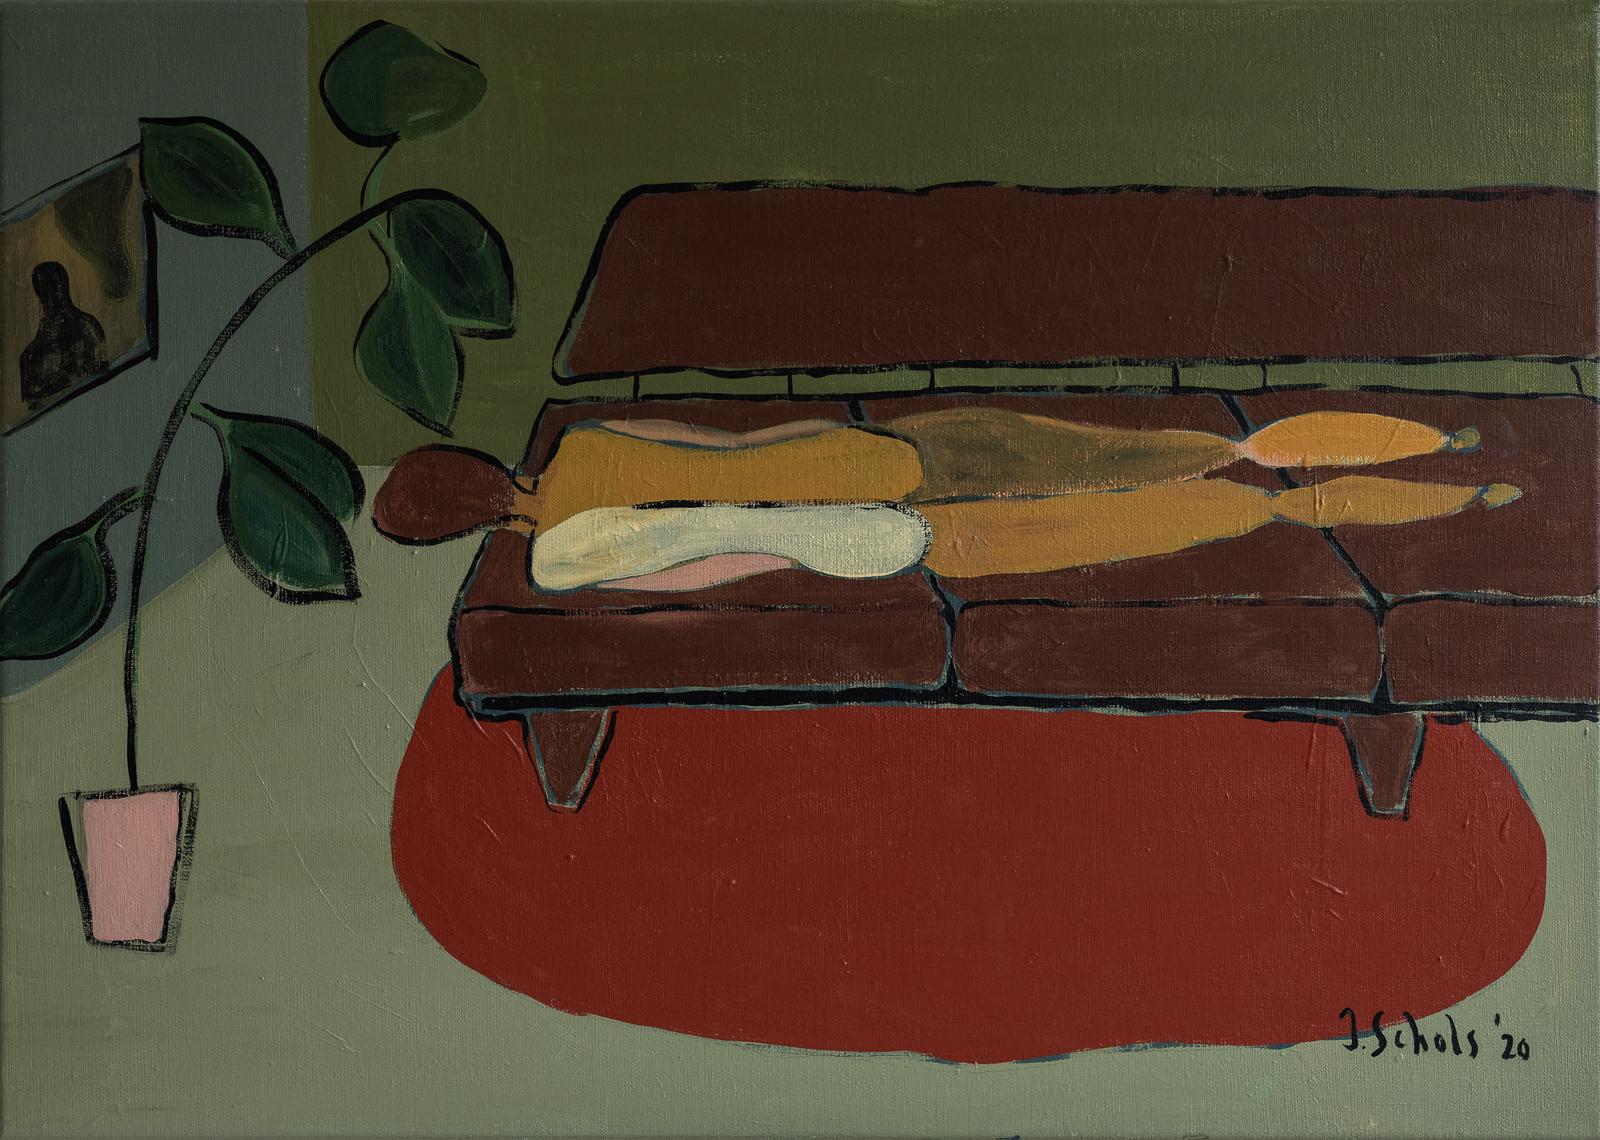 MORE INFO & PRICINGTitle: Op de sofaAcrylics on linen canvas70 x 50 cmMore details 'Op de sofa'